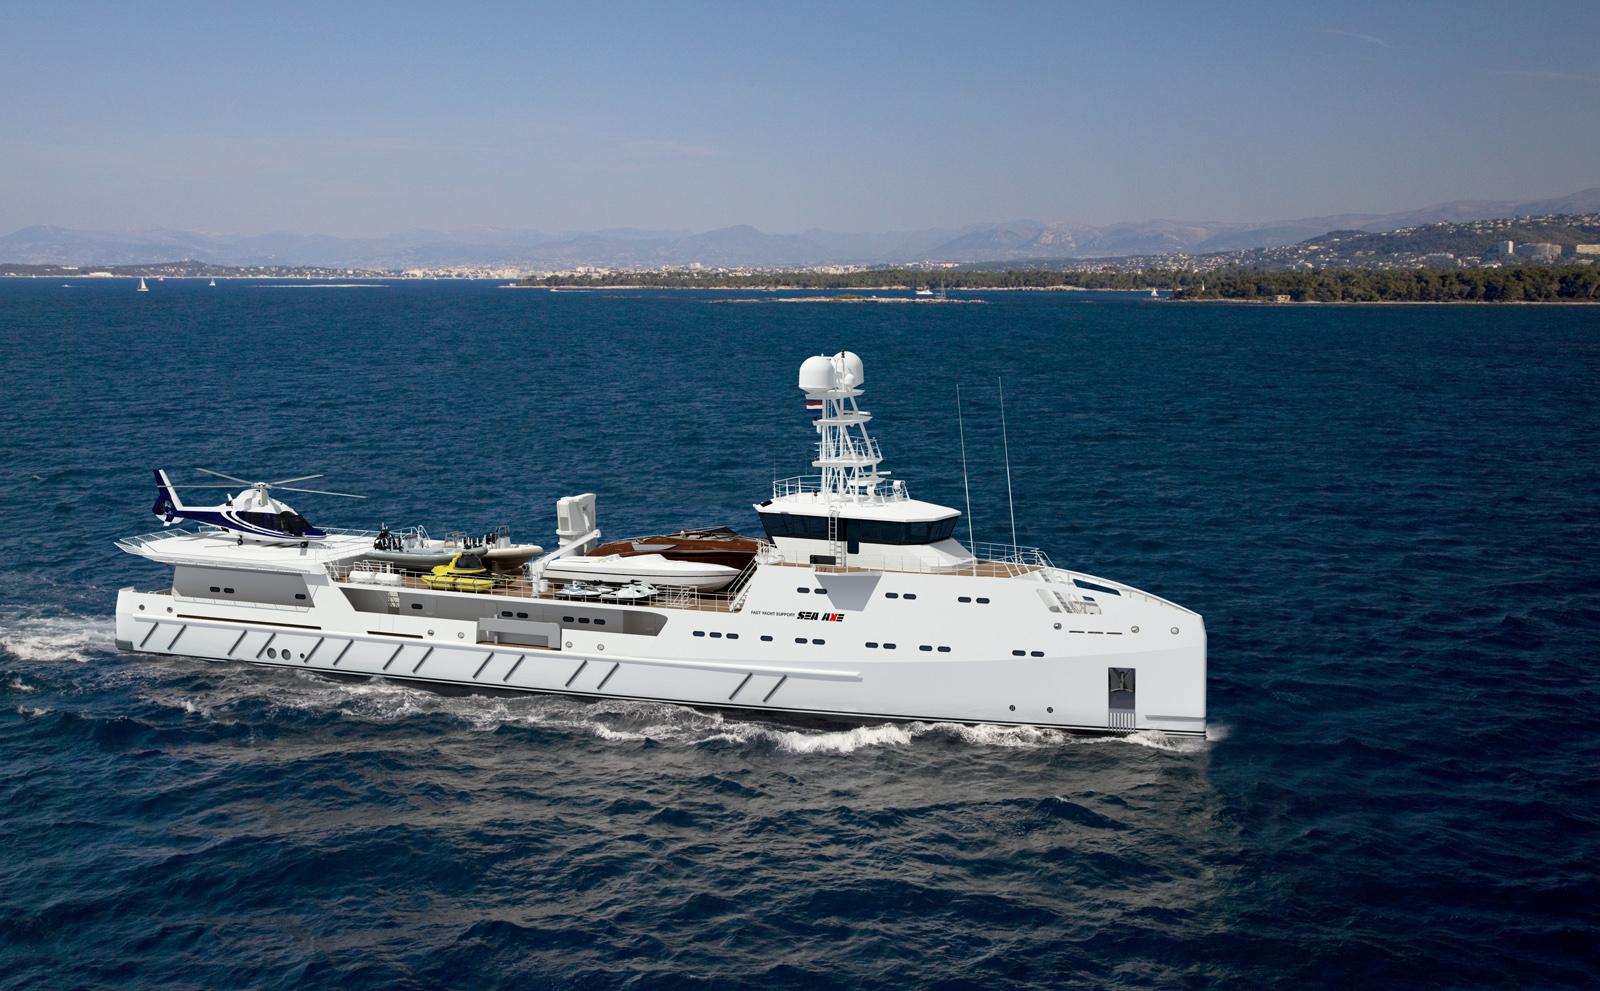 Luxury superyacht keyla interior by hot lab luxury yacht charter - 67m Damen Built Fast Yacht Support Vessel Gar On